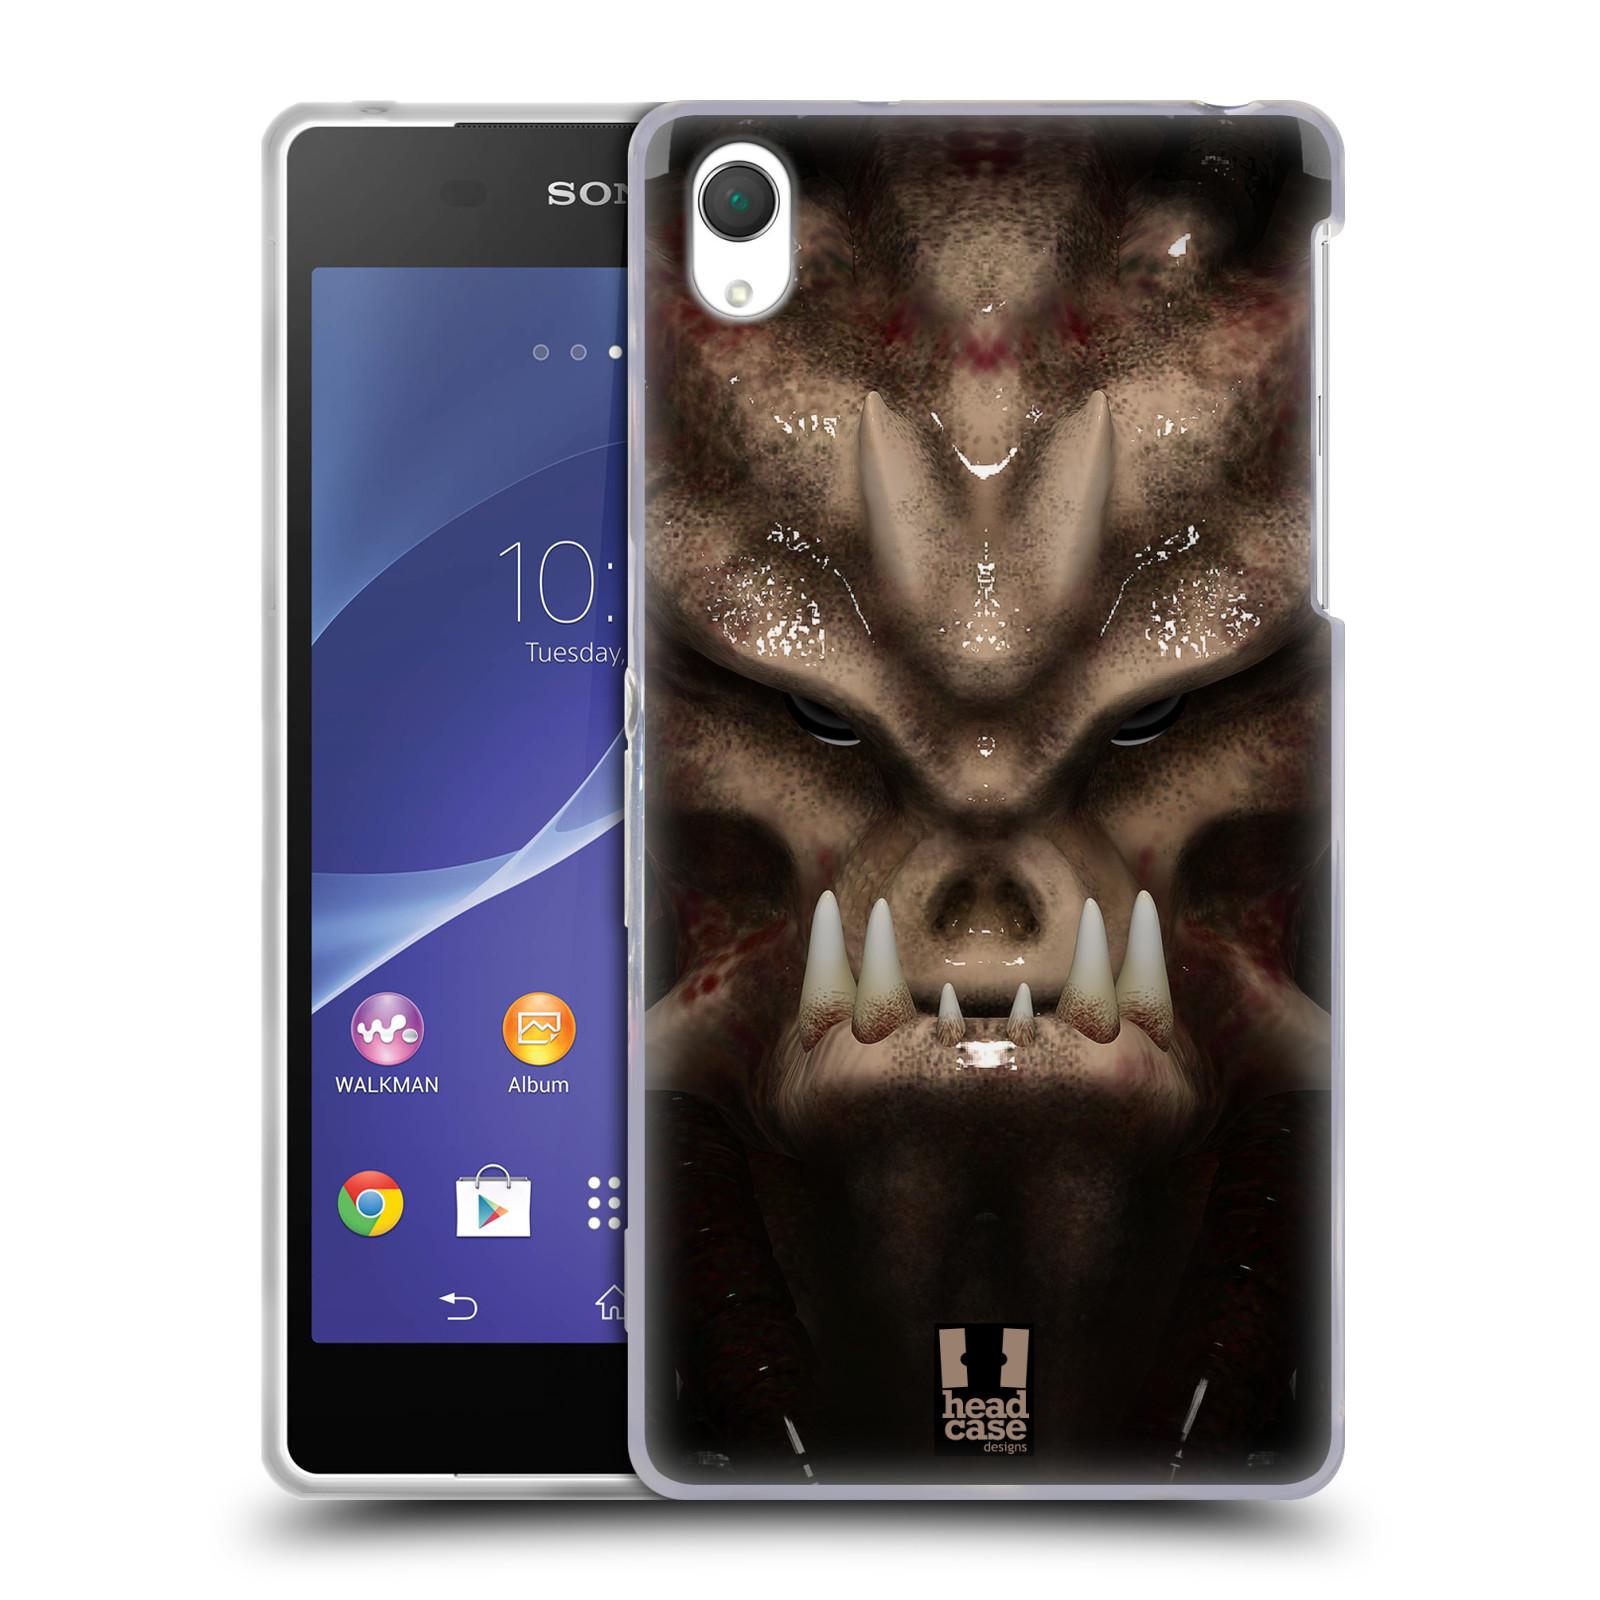 Silikonové pouzdro na mobil Sony Xperia Z2 D6503 - Head Case - Ufoun Warhead